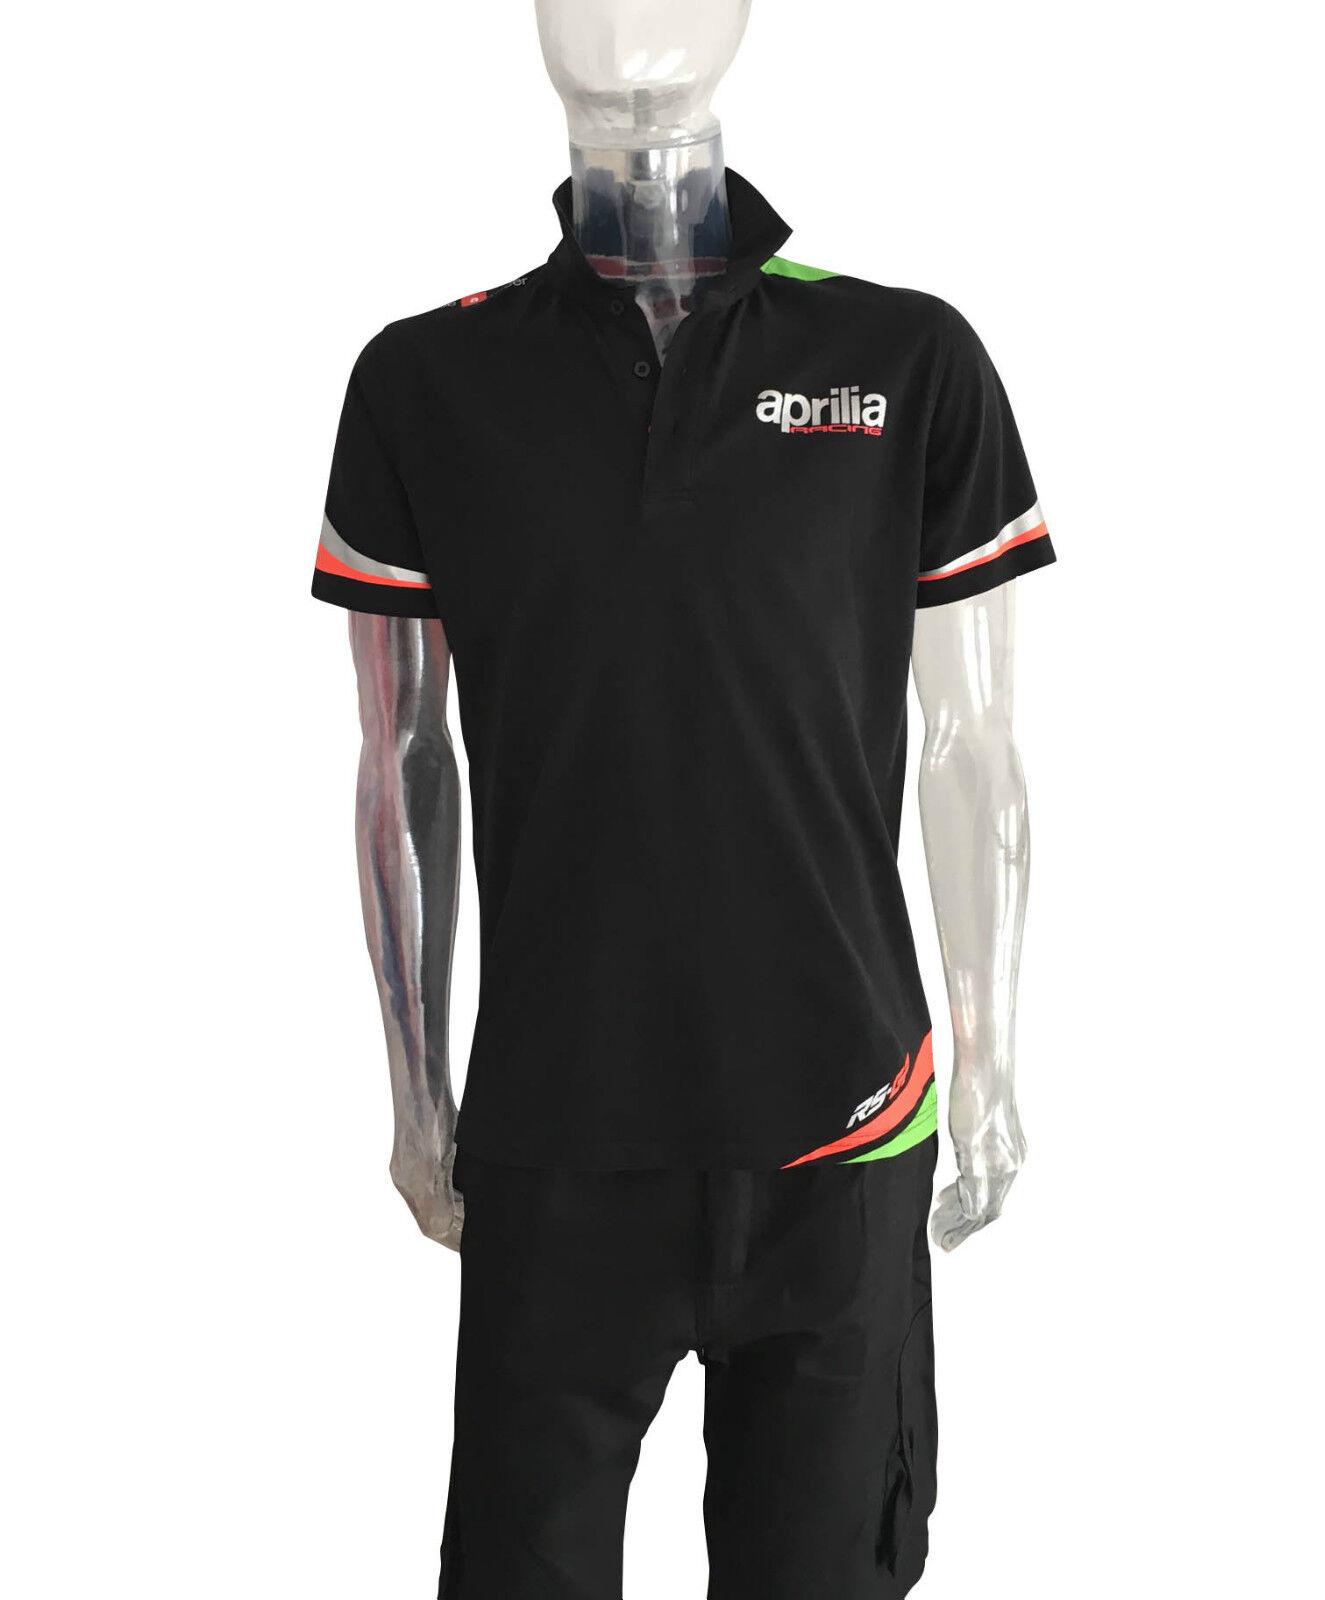 2016 2016 2016 OFFIZIELL Aprilia Team Spin über schwarz Polo aa00c4